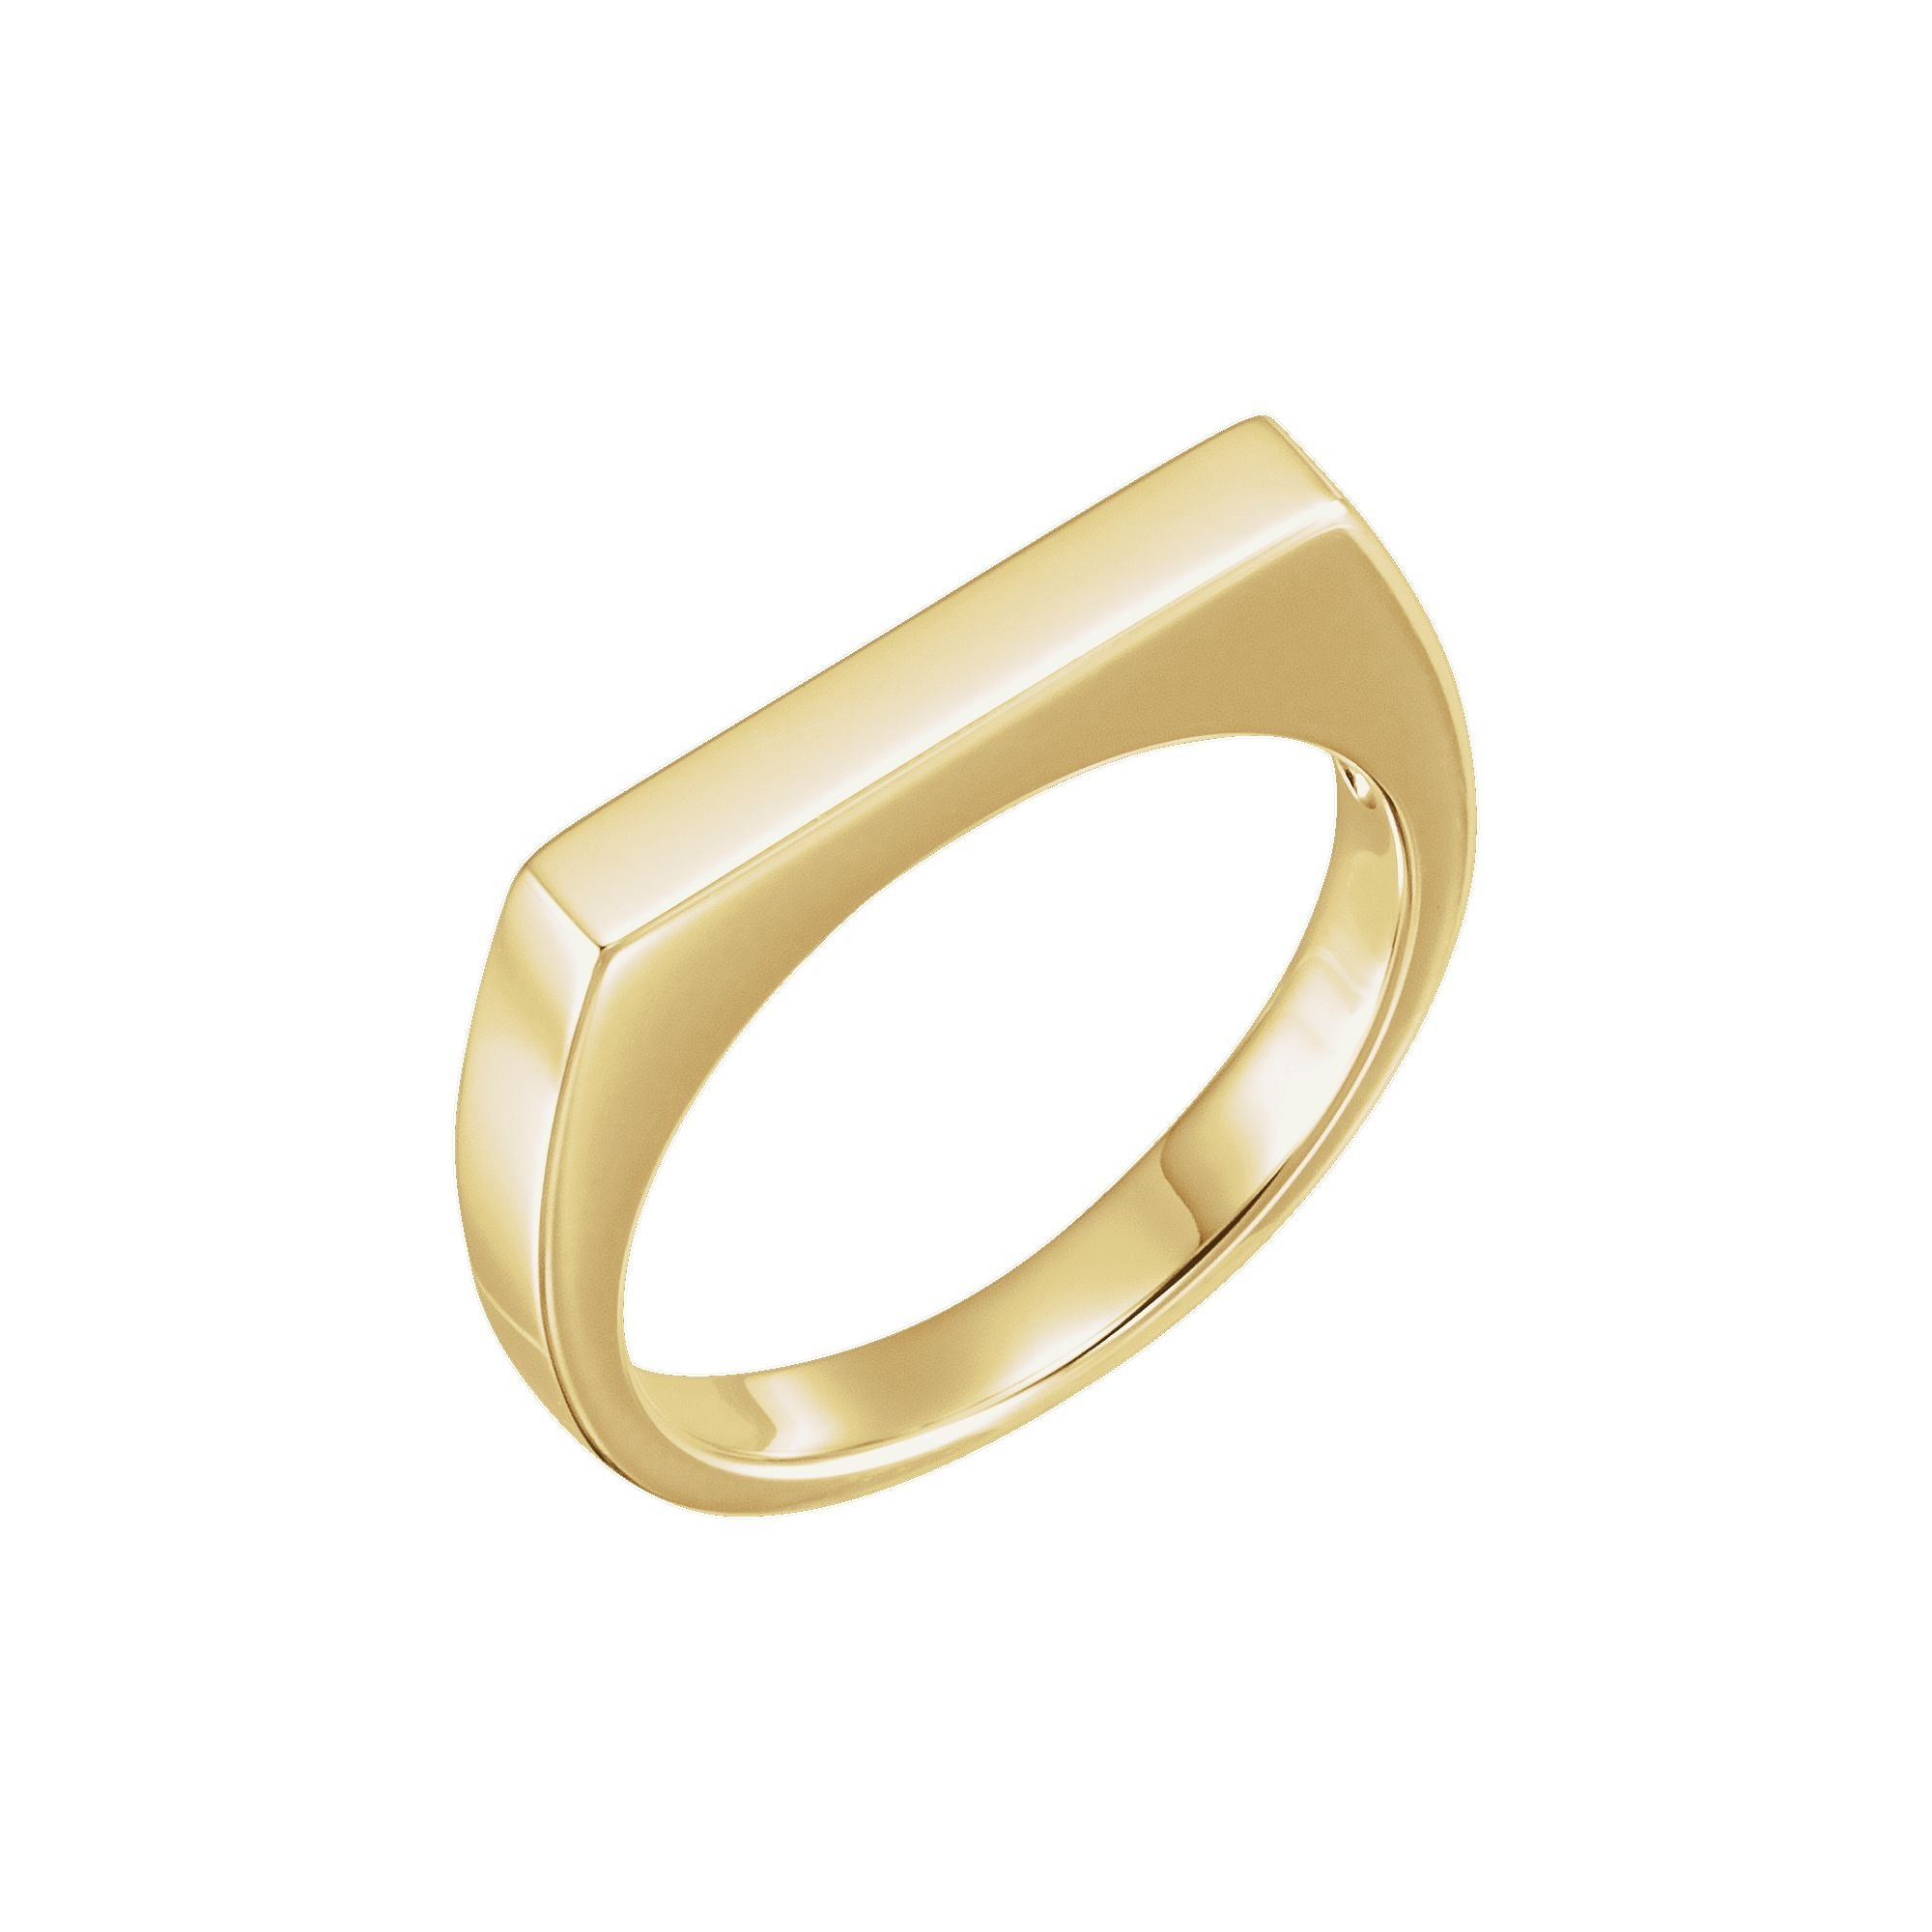 14K Yellow Gold 3mm Rectangular Top Stackable Ring